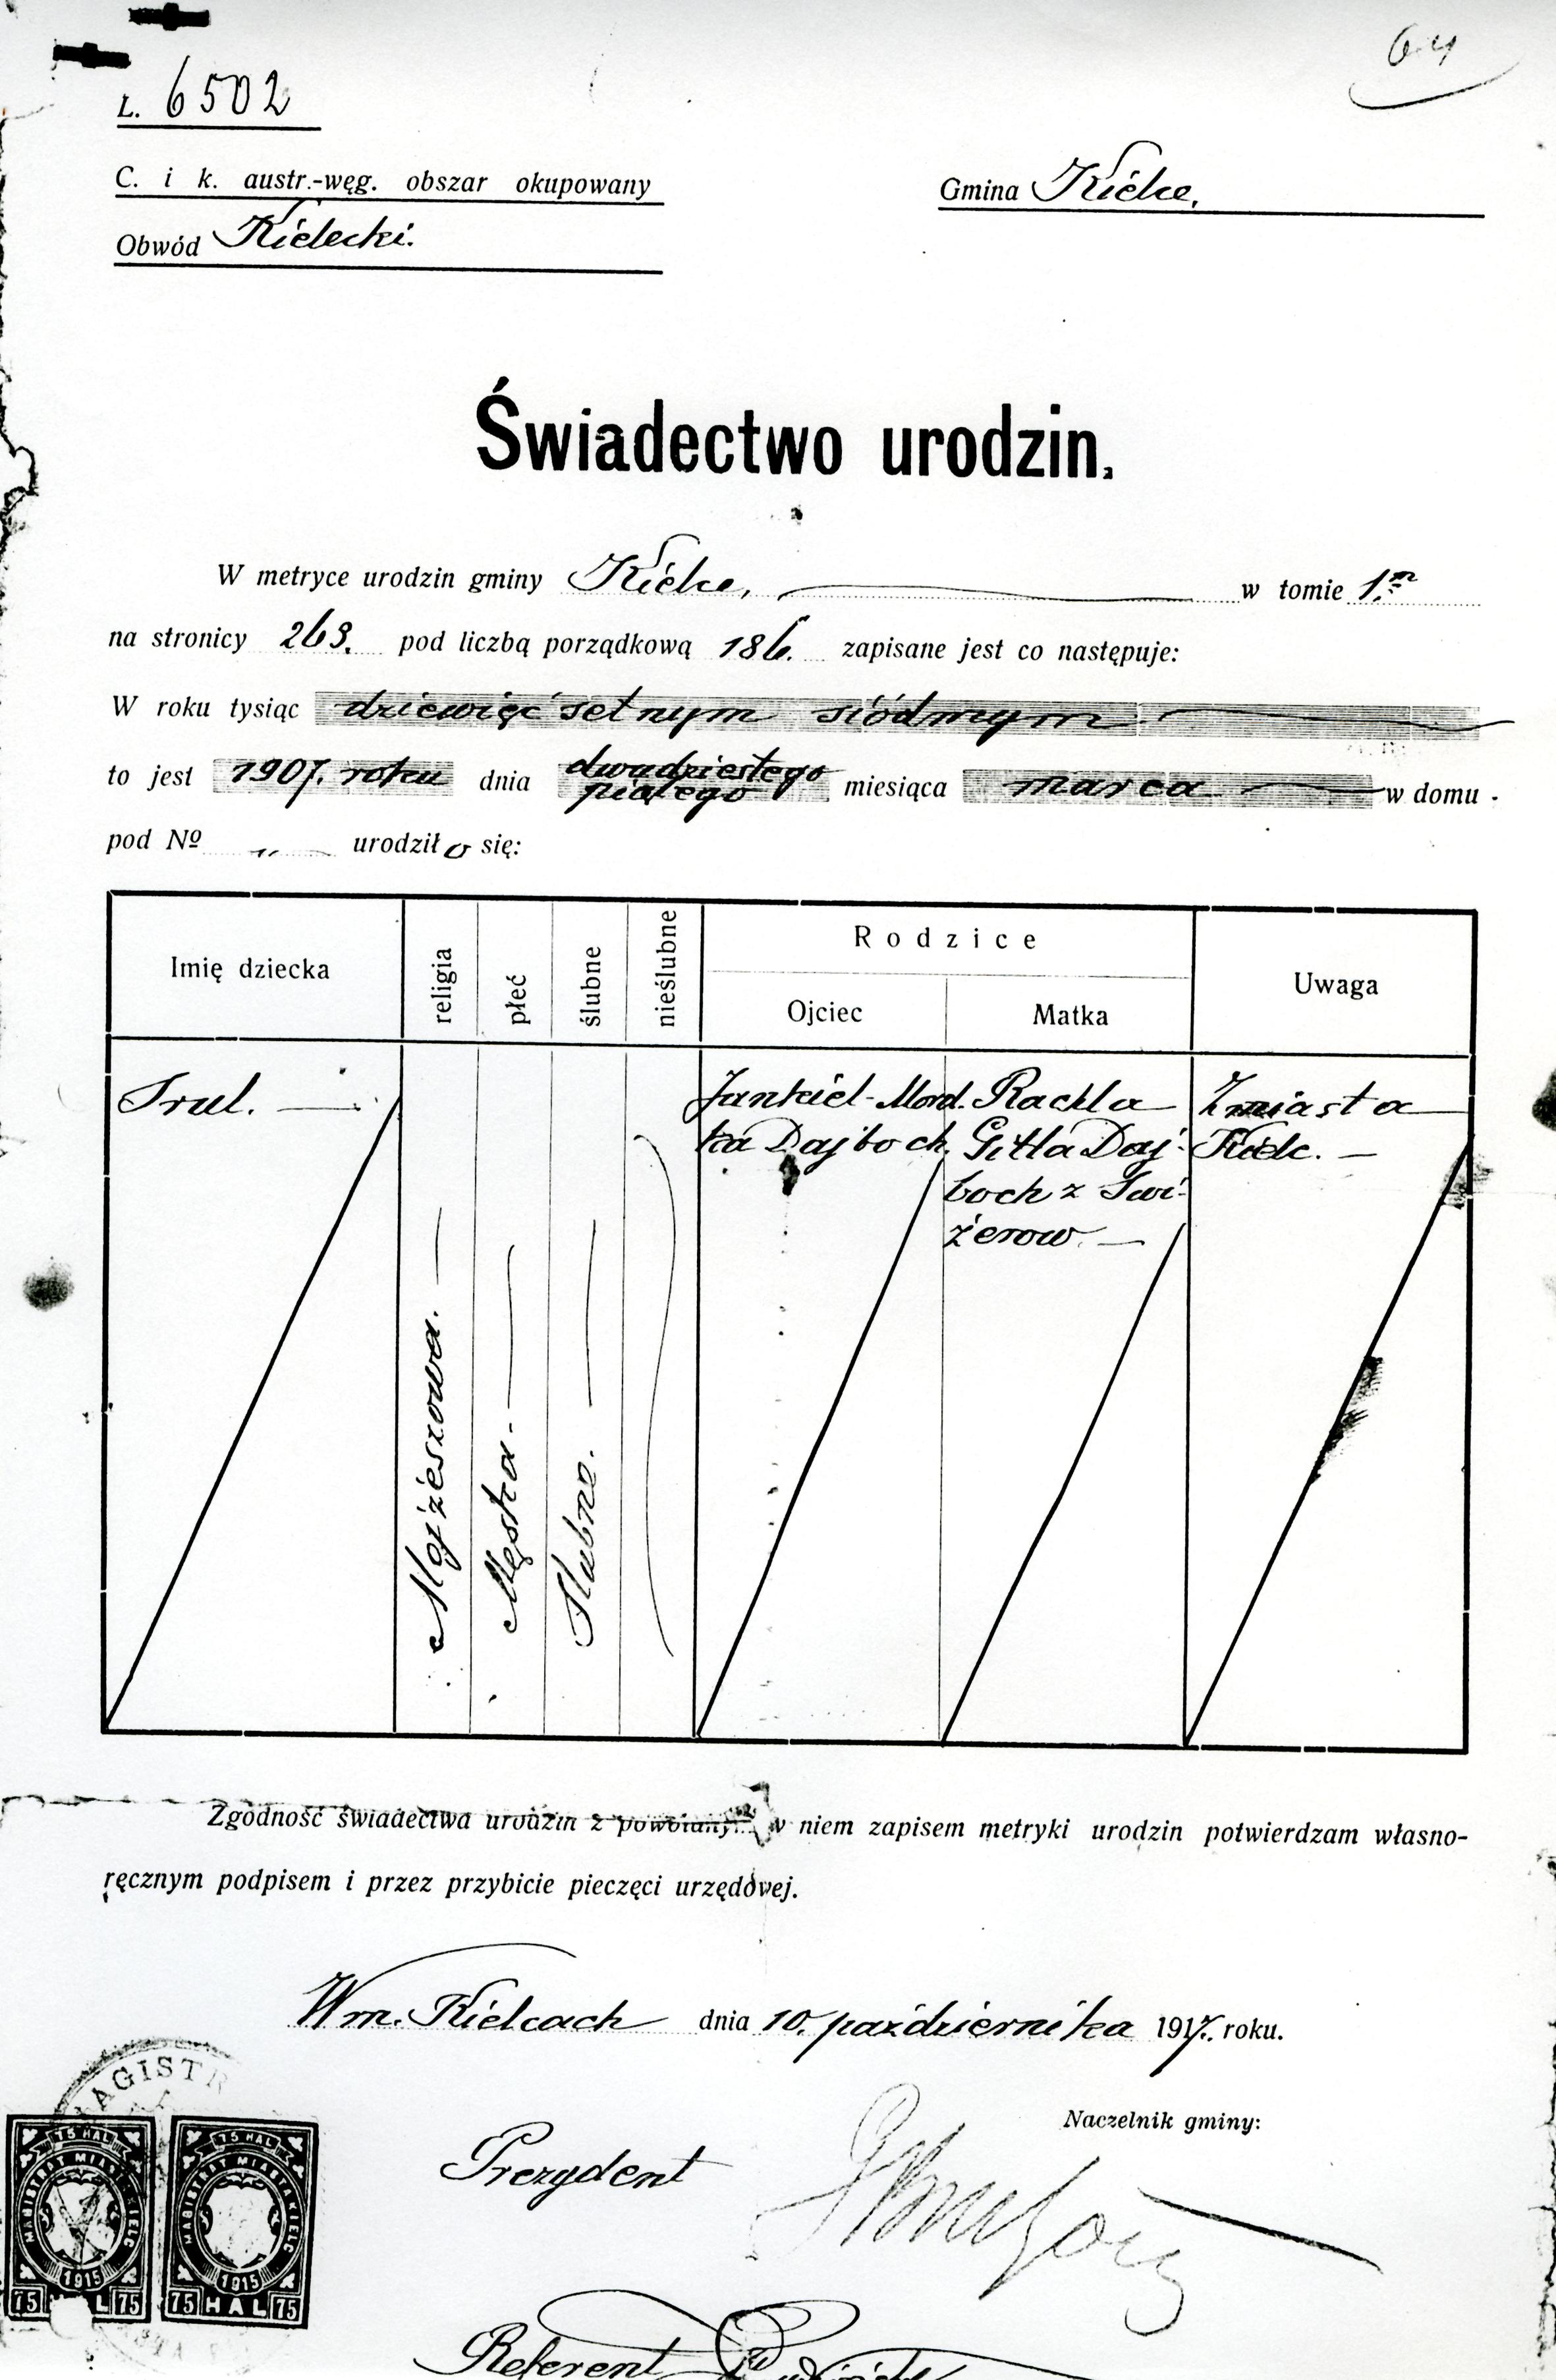 Srul Dajbog's birth certificate